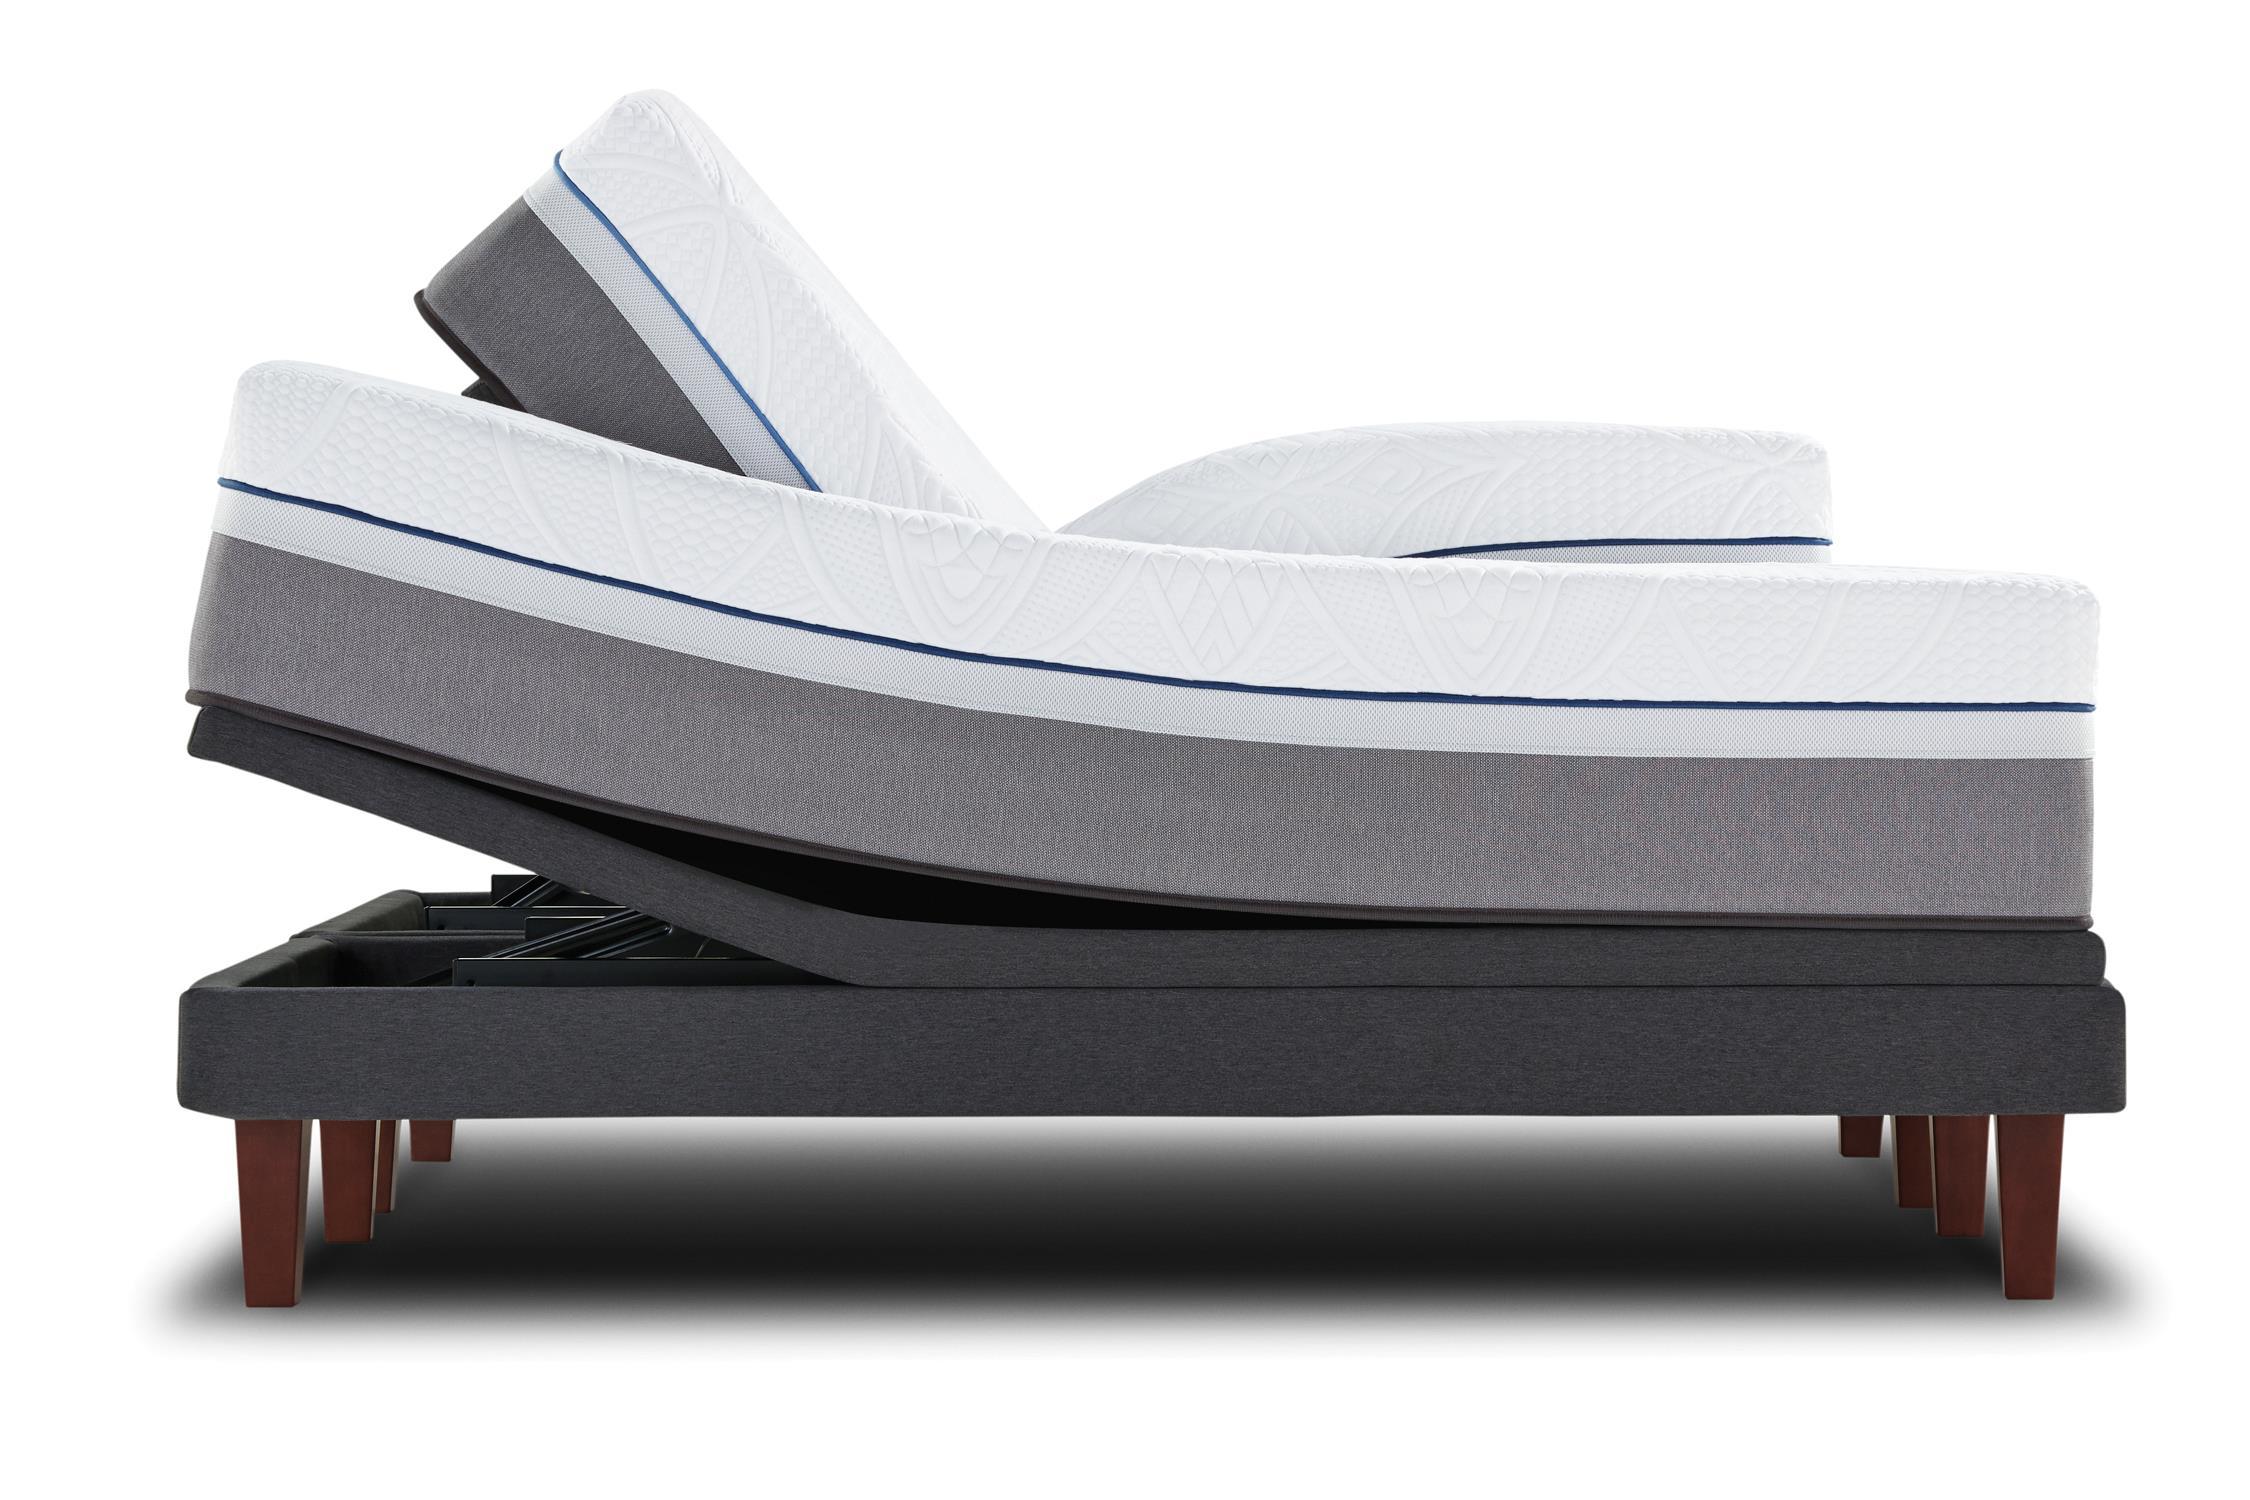 Sealy Posturepedic Hybrid Copper Queen Plush Hybrid Mattress Adj Set - Item Number: PlushHybrid-Q+609663Q